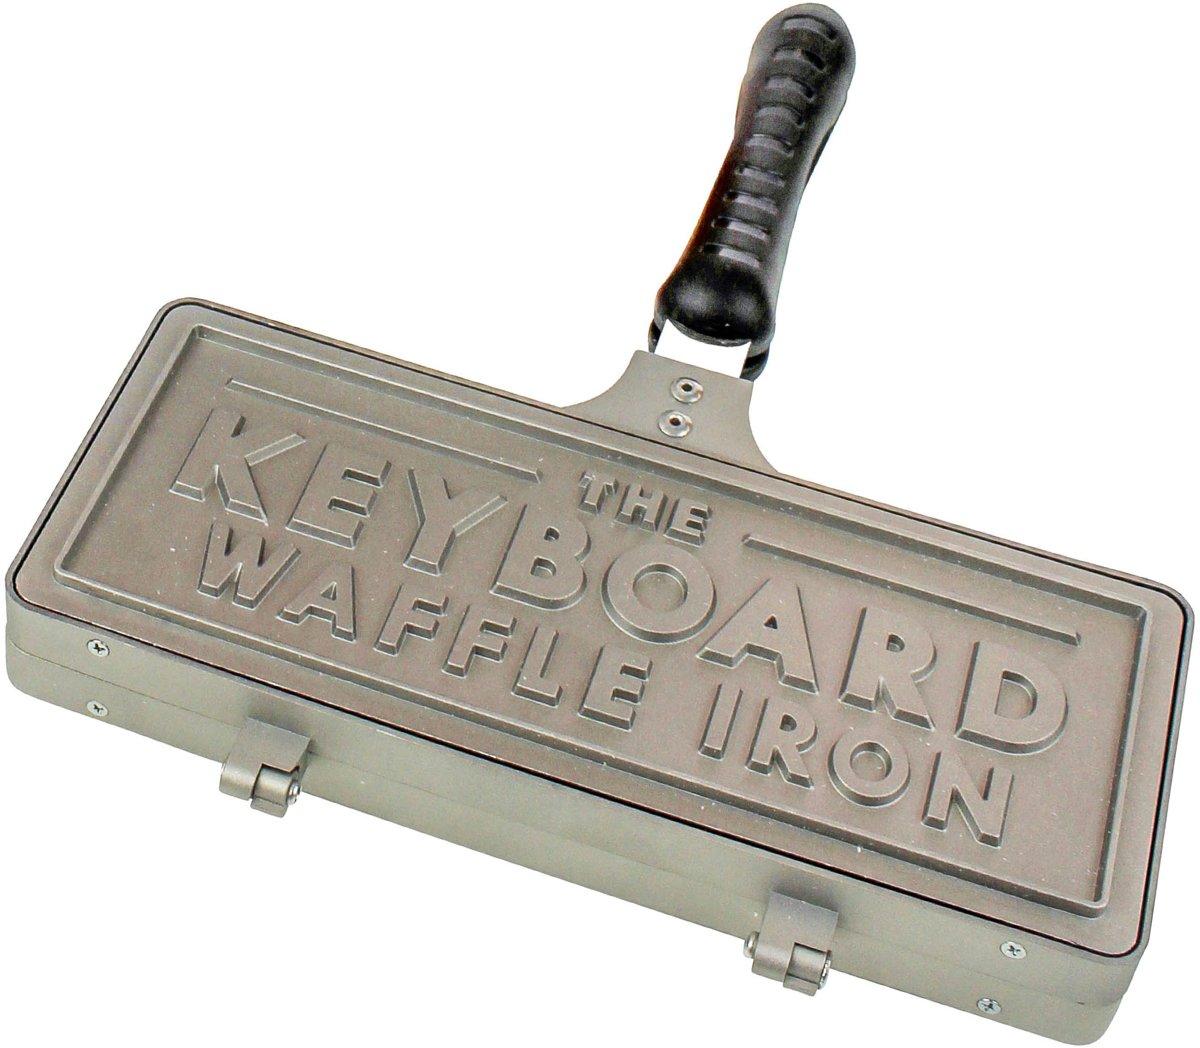 The Keyboard Waffle Iron - Keyboard Wafelijzer